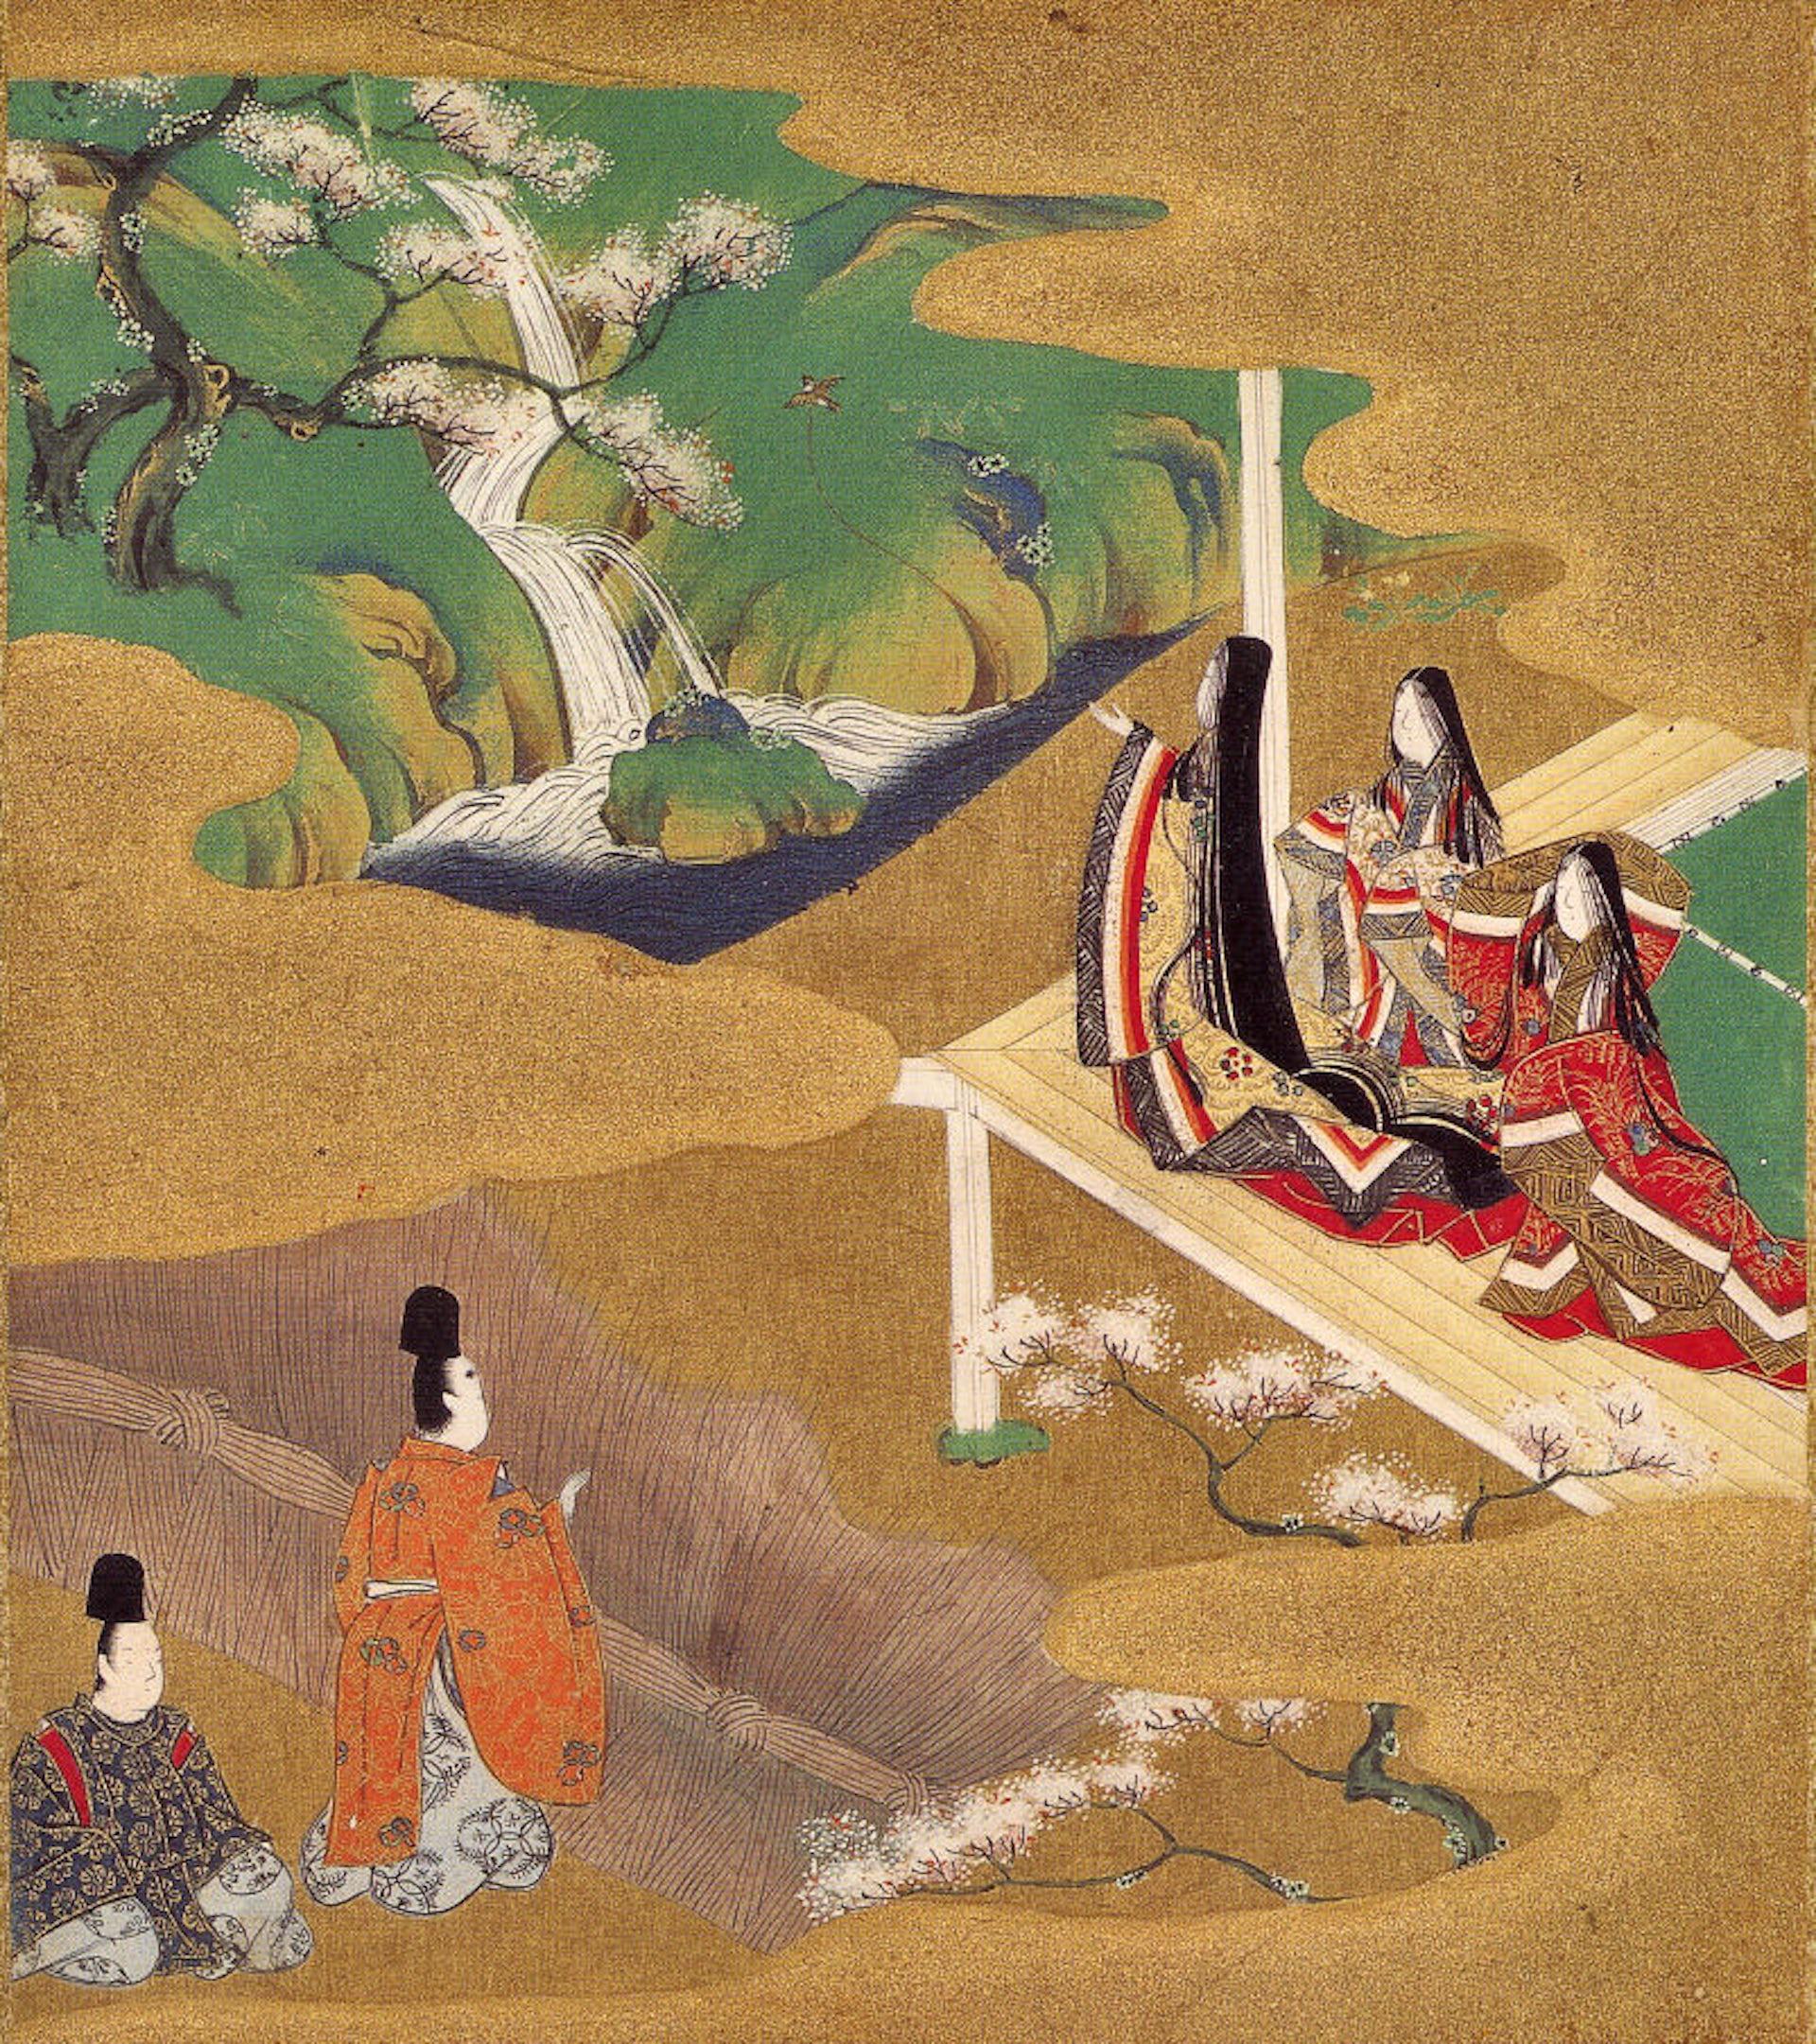 Illustration of sakura in Japan's most celebrated work of literature, Jap by Murasaki Shikibu.